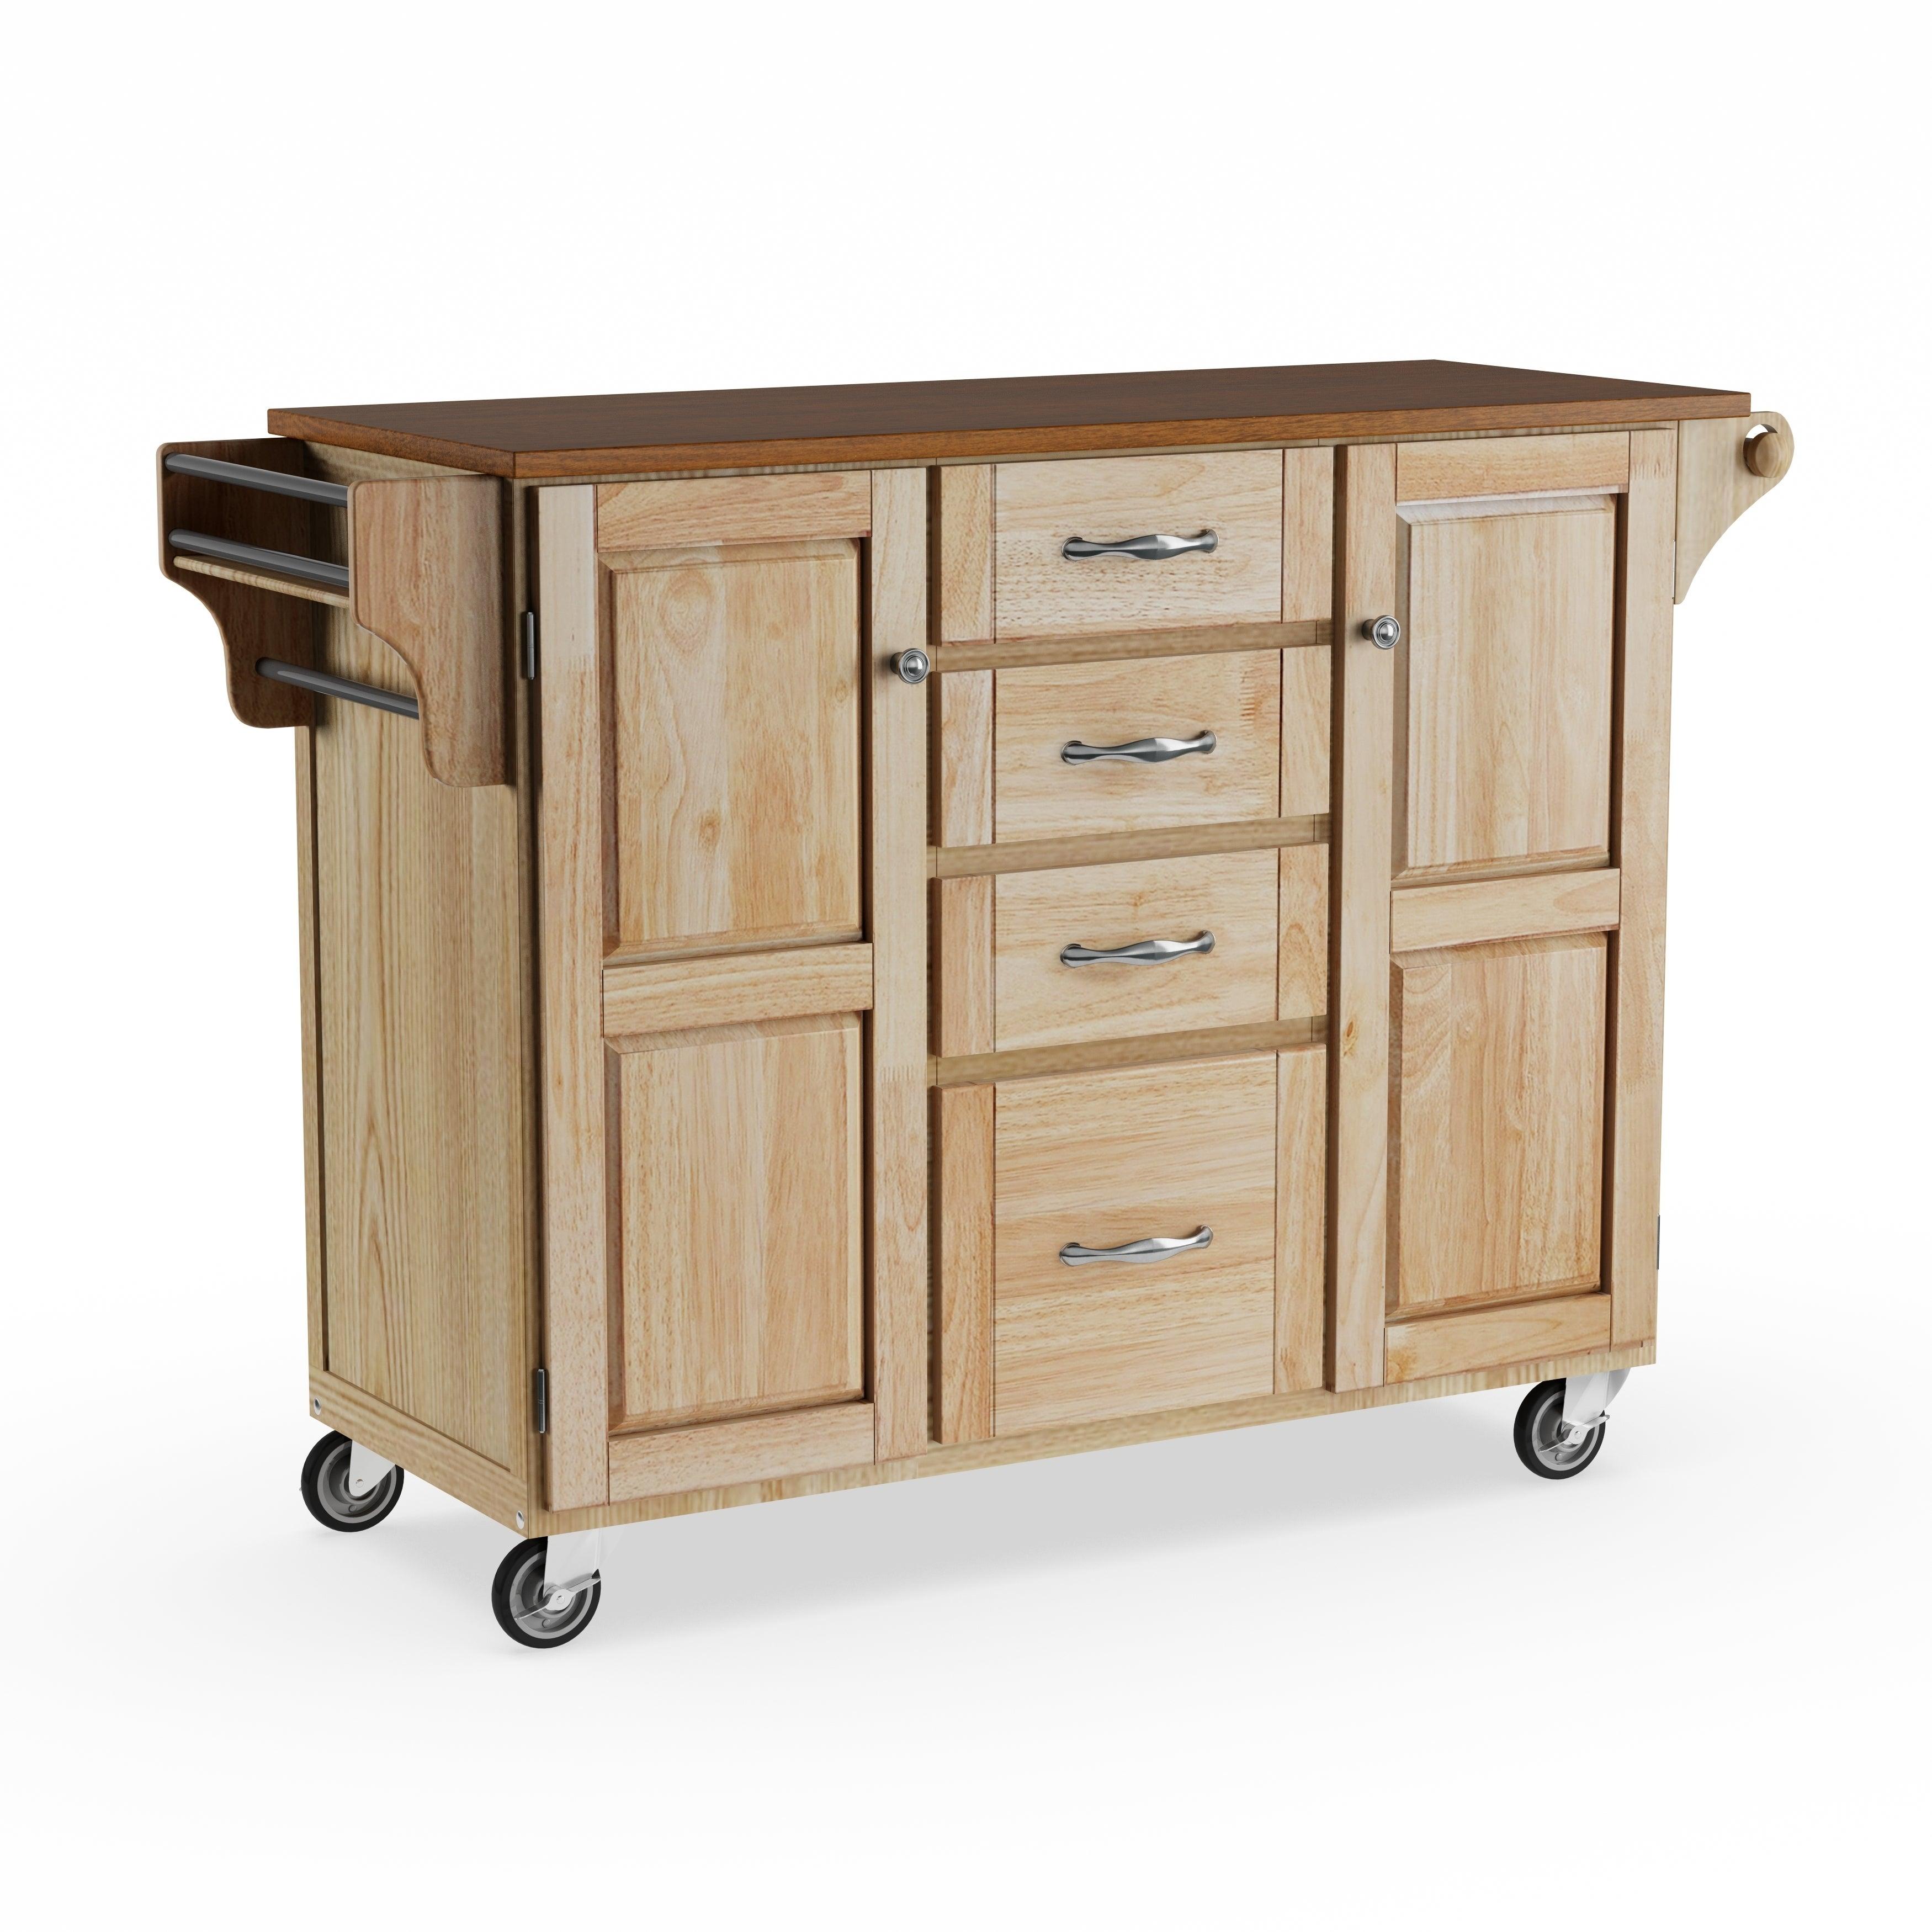 Copper Grove Puff Island Natural Finish 4 Drawer Kitchen Cart